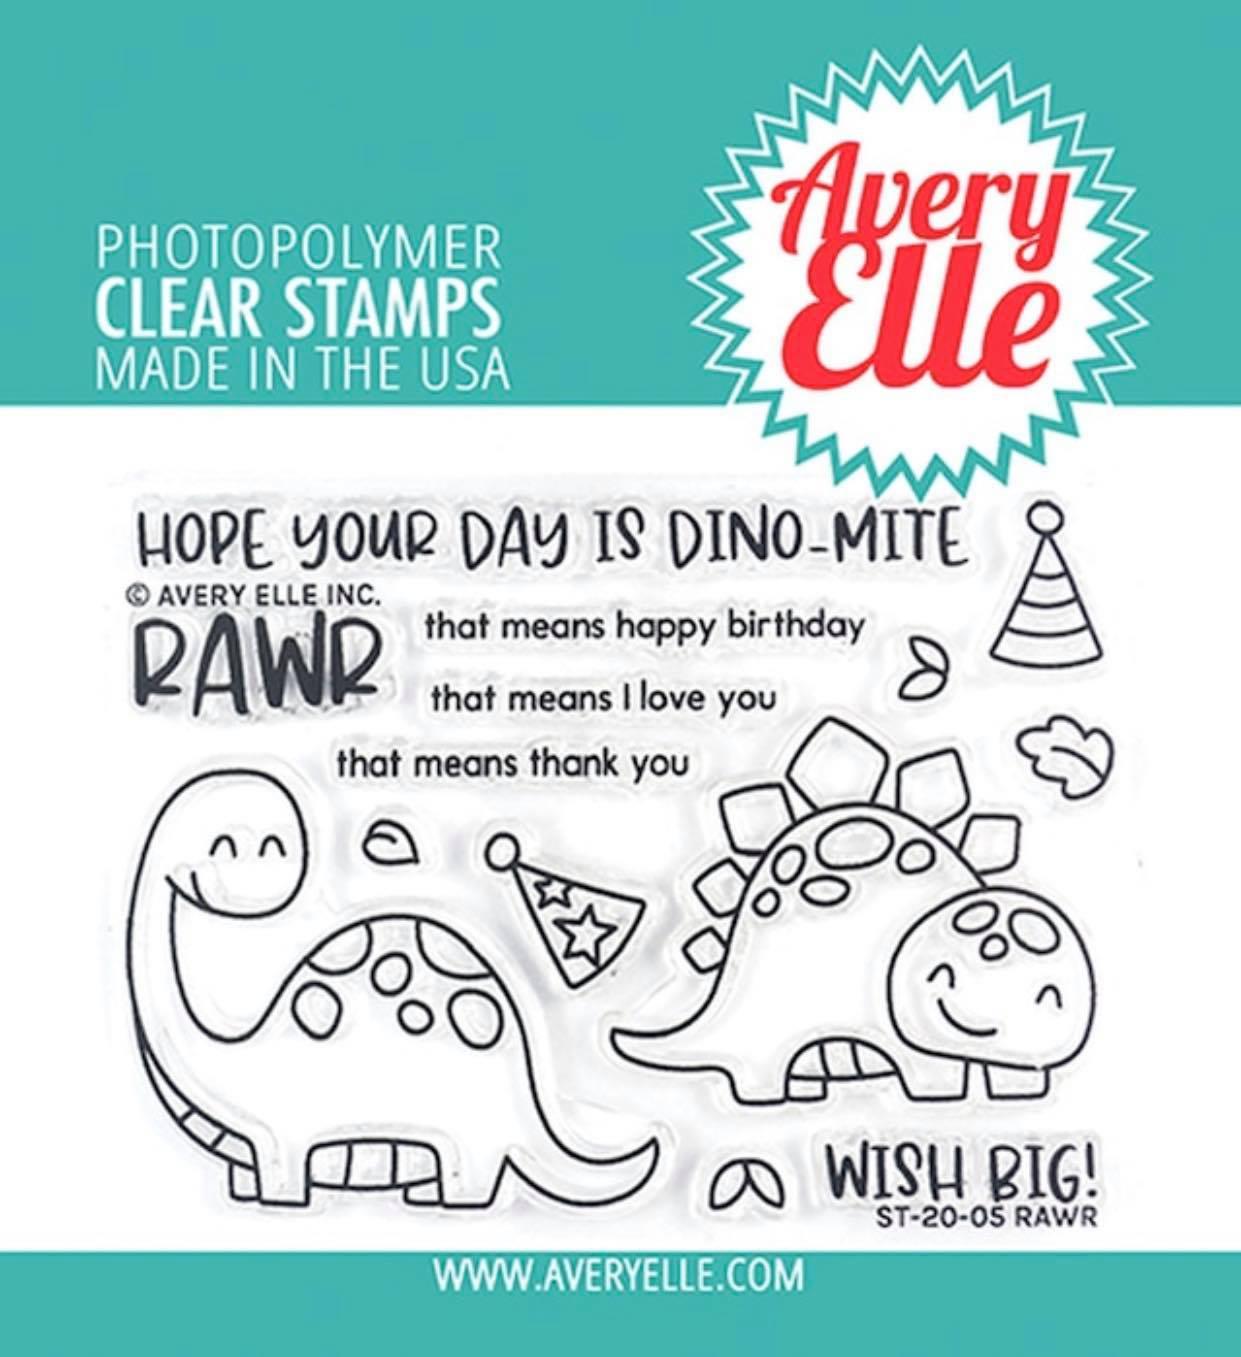 Avery Elle - Rawr Stamp Set